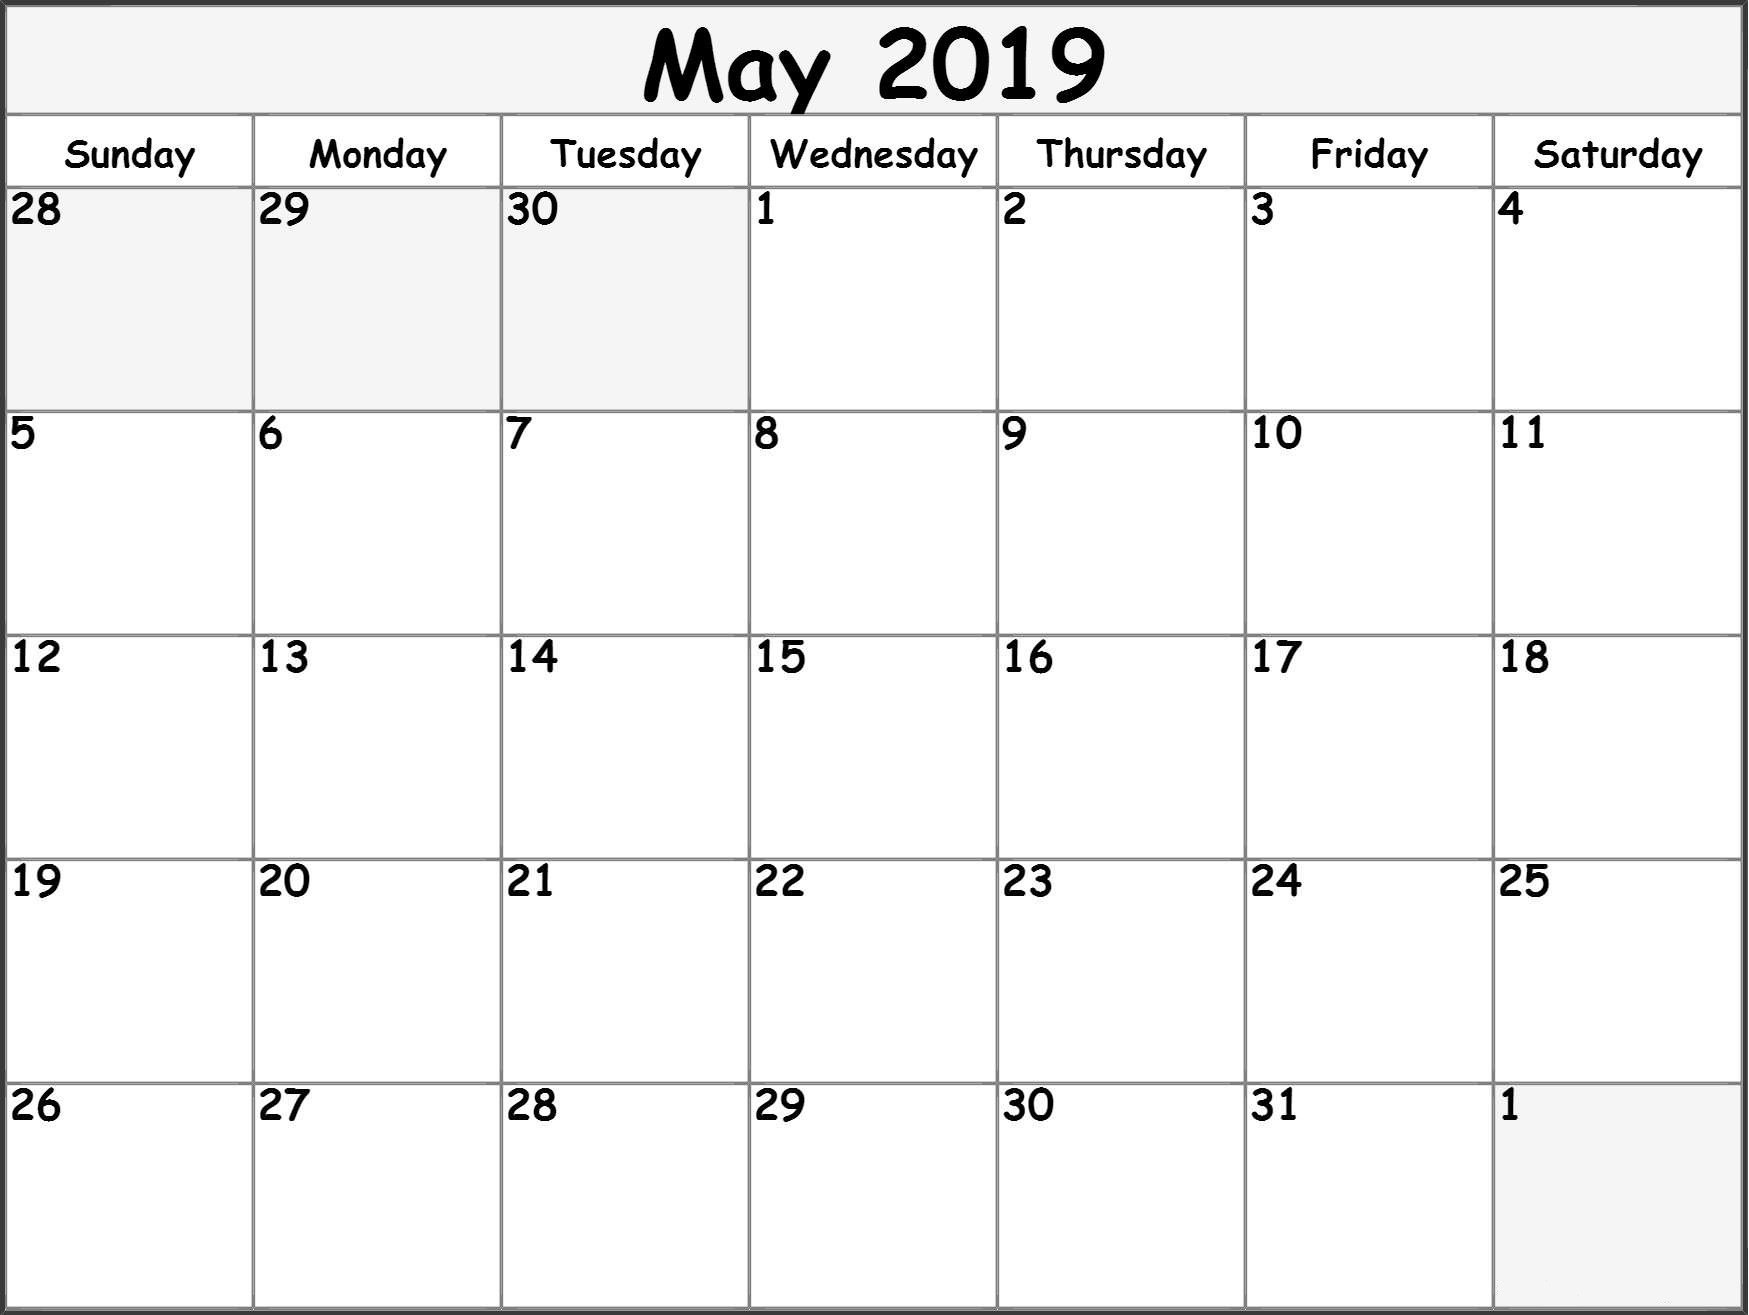 May 2019 Printable Calendar Templates Free Blank PDF